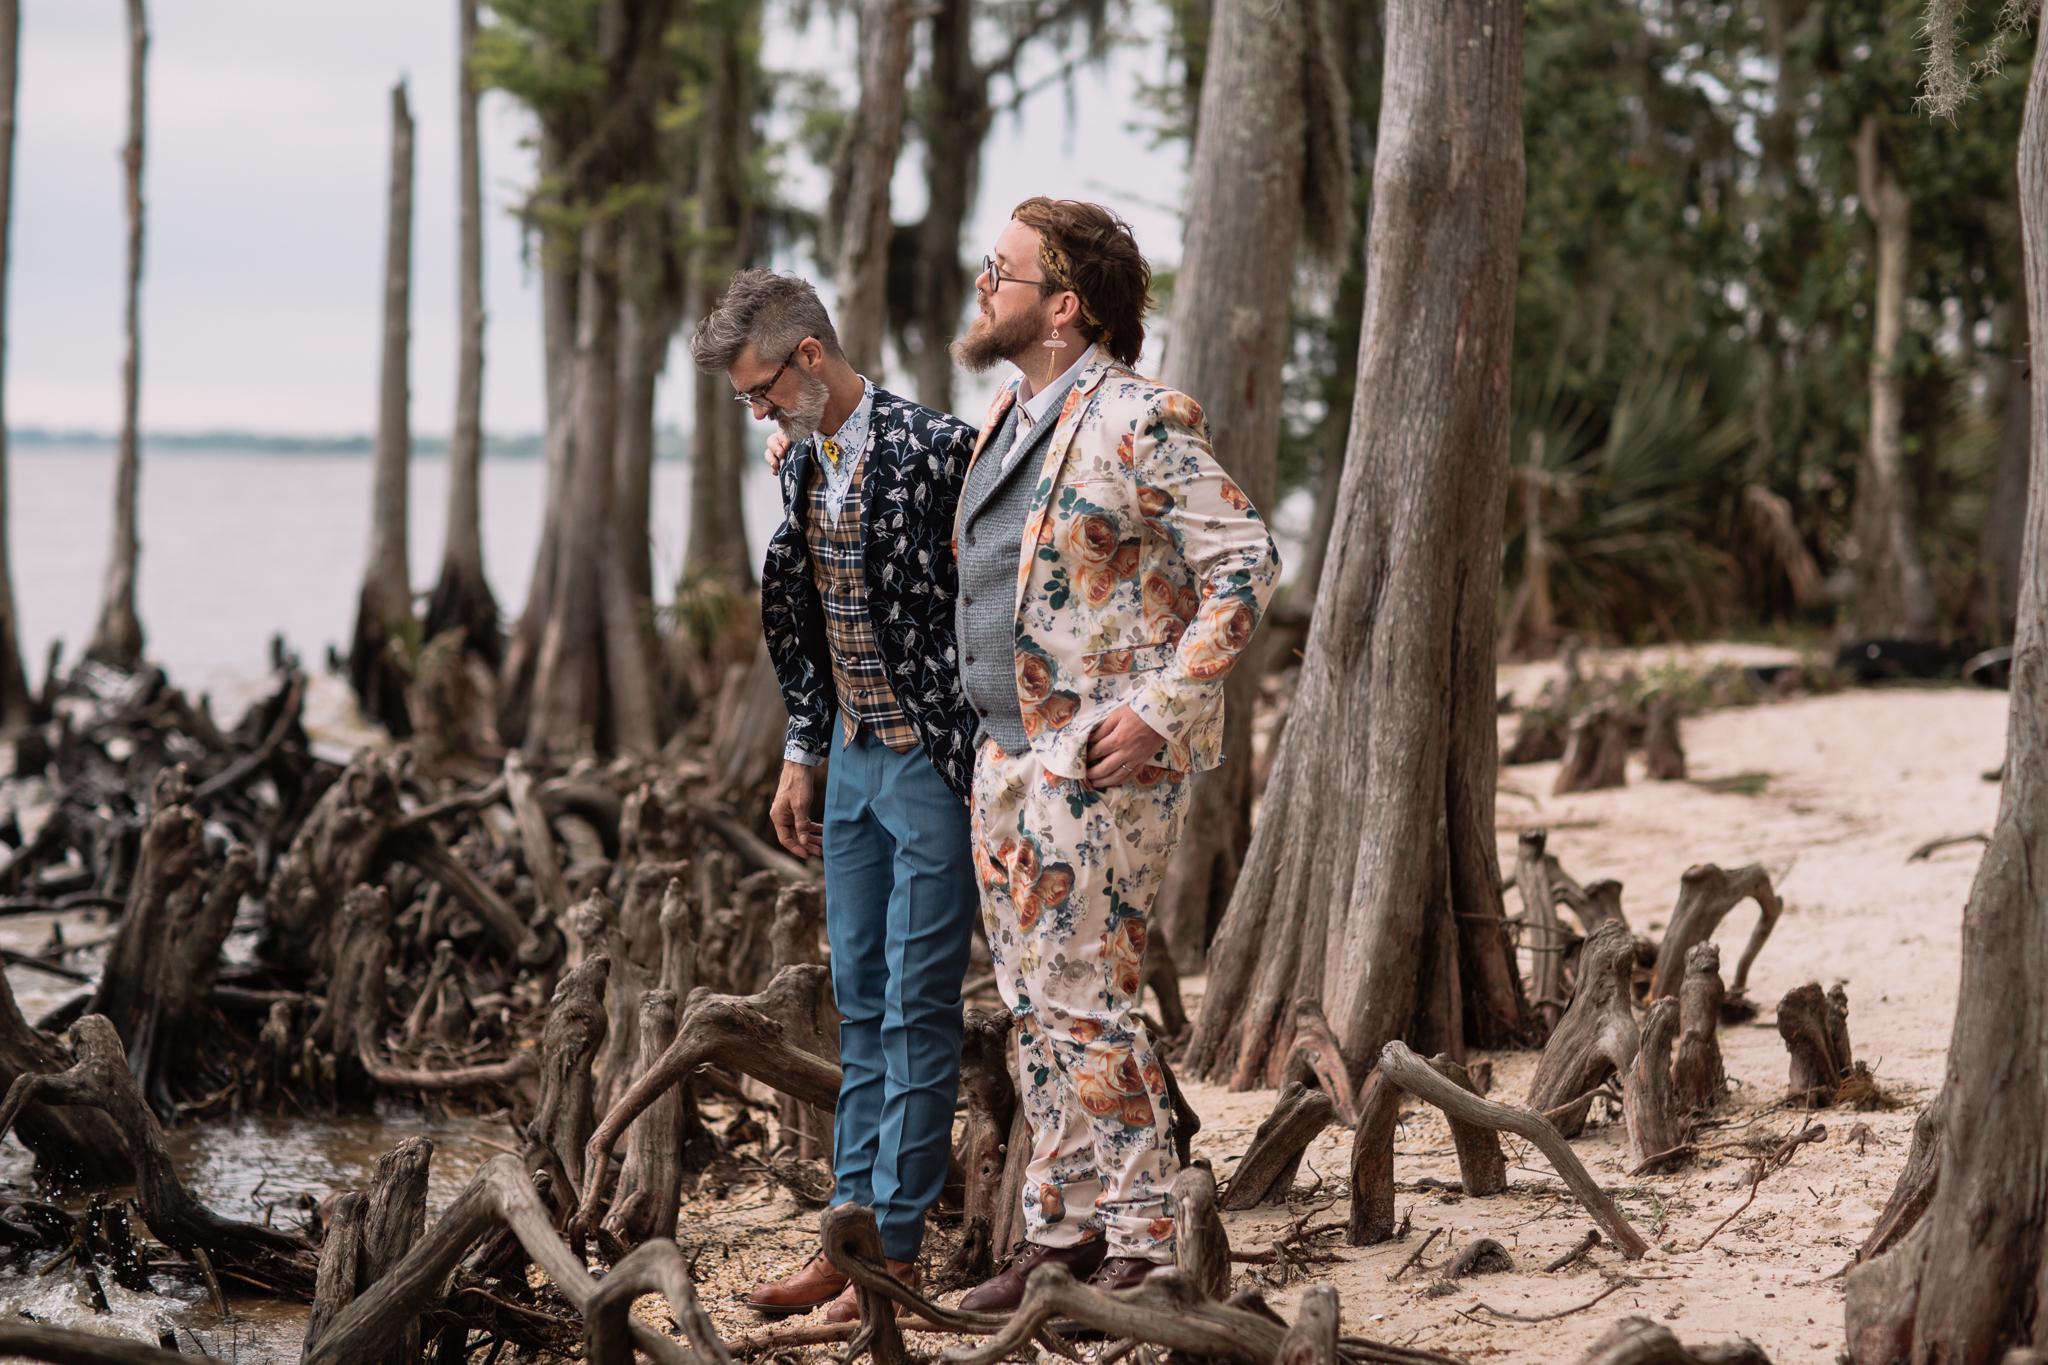 Tim and David - New orleans Wedding - Kallistia Photography-2.jpg